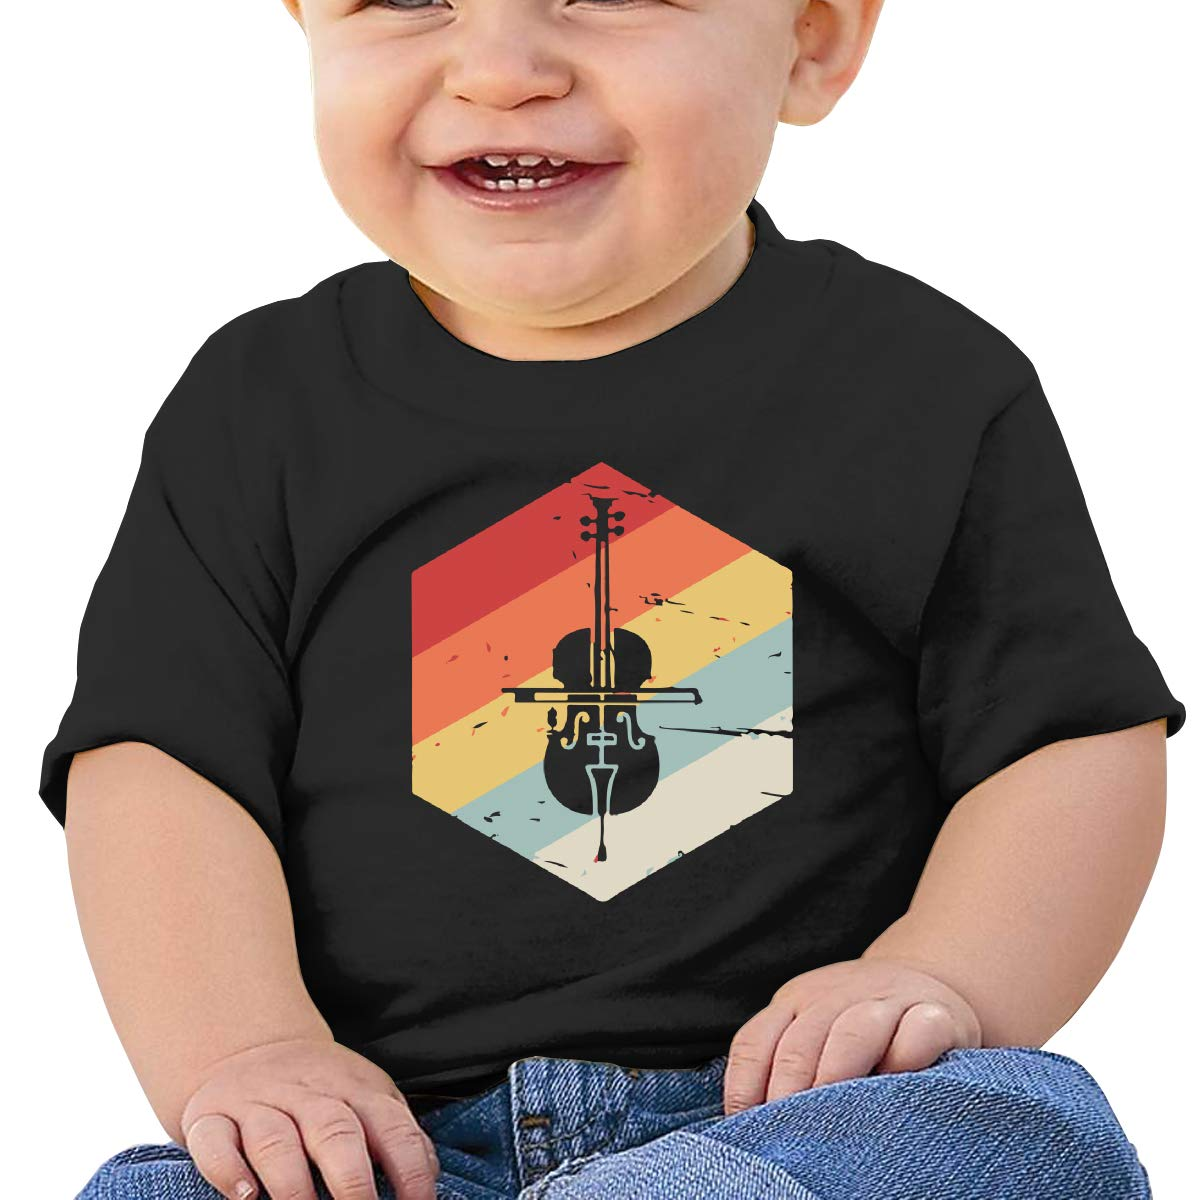 Retro 70s Cello Icon Baby Girls Newborn Short Sleeve T-Shirt 6-24 Month Cotton Tops